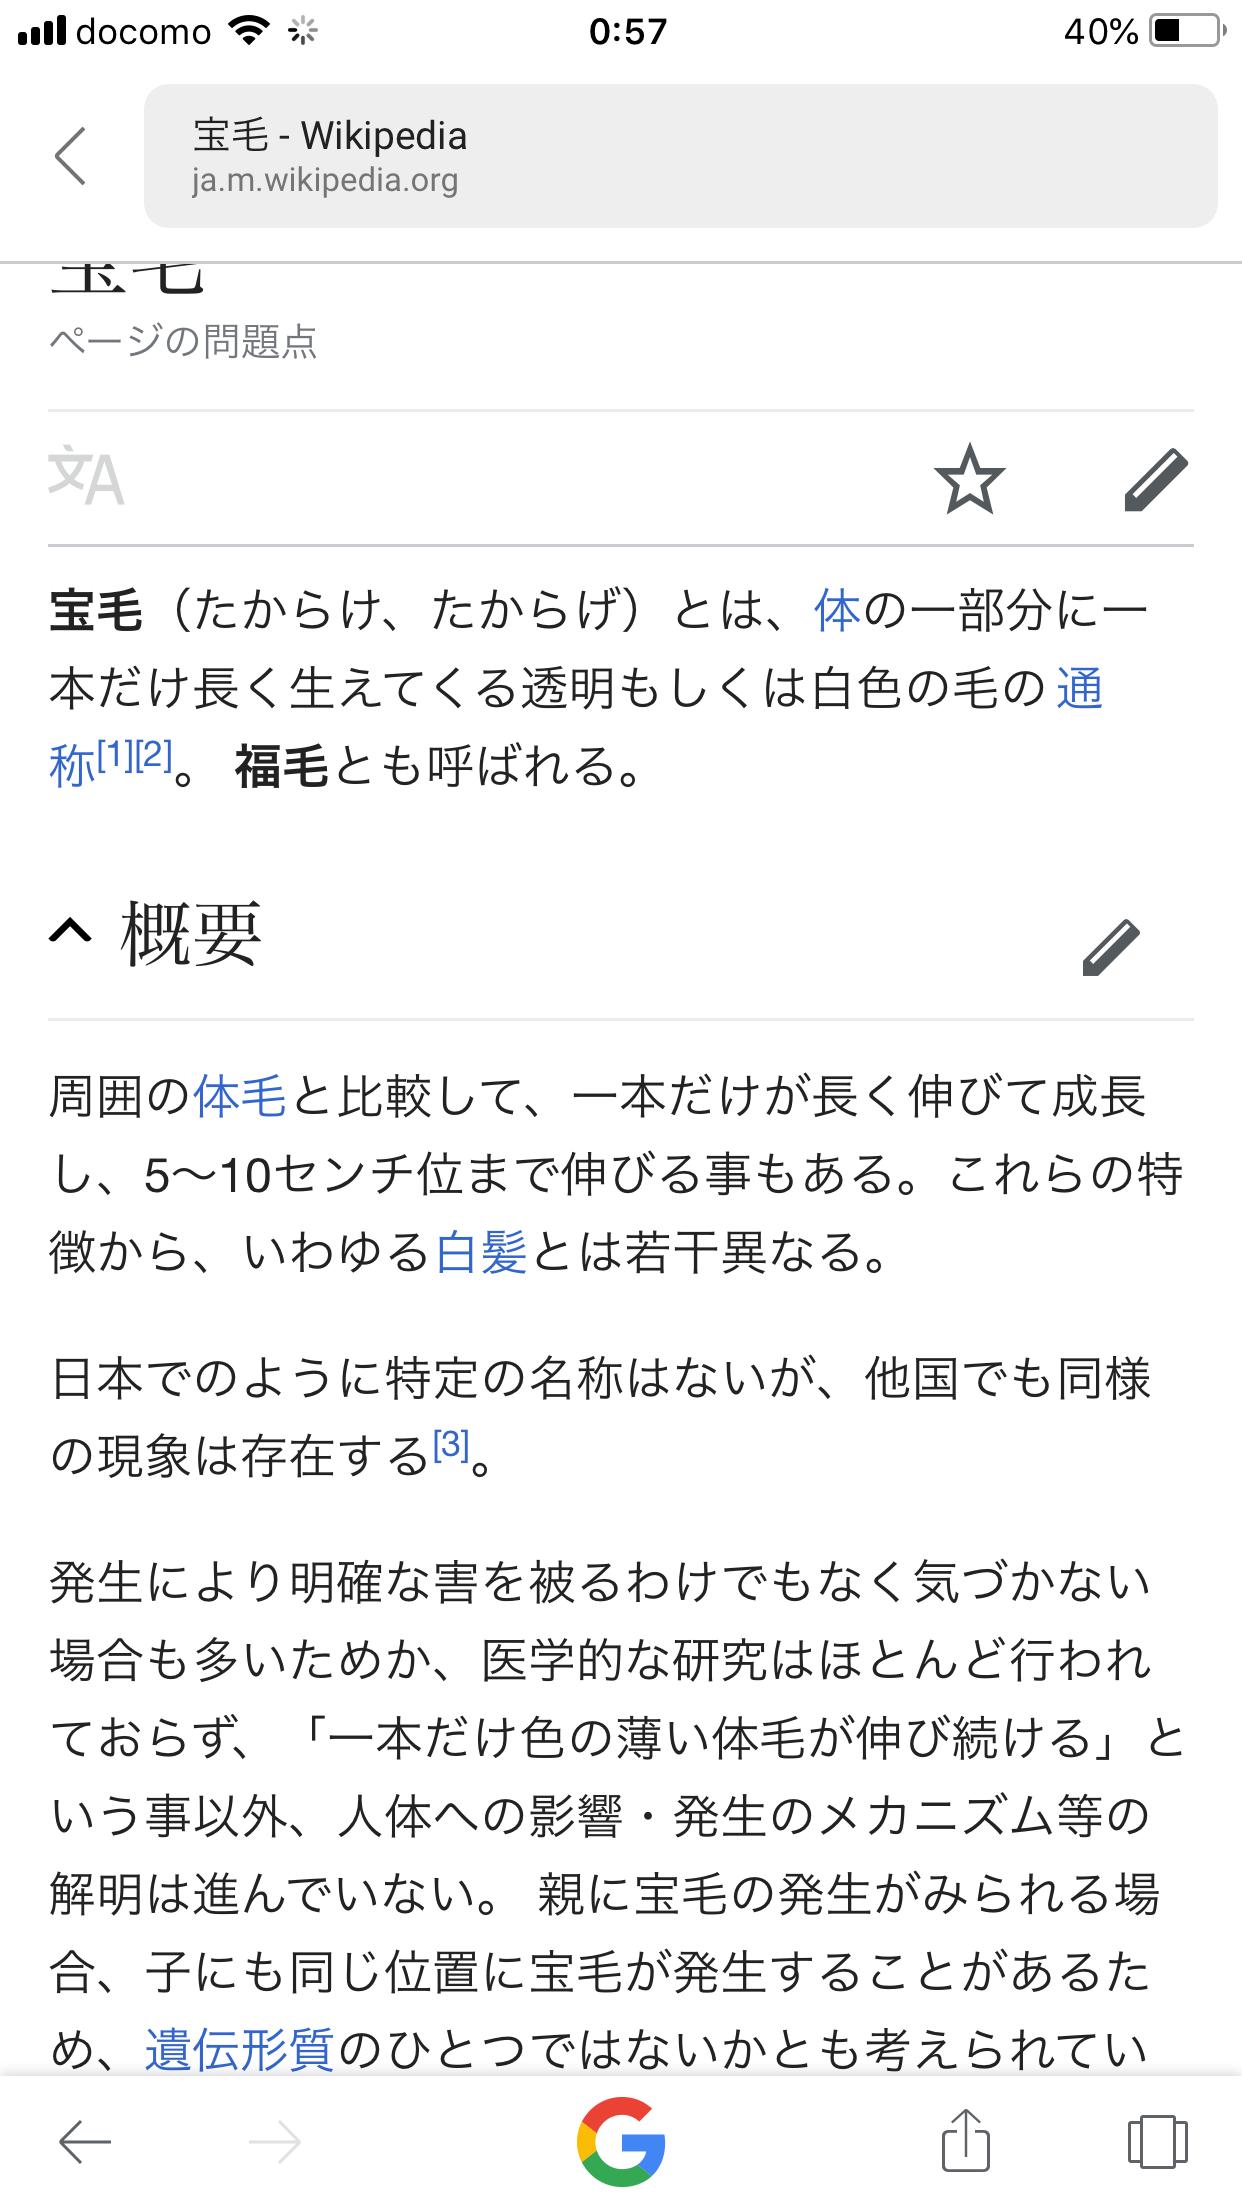 f:id:szk96:20180420010231p:image